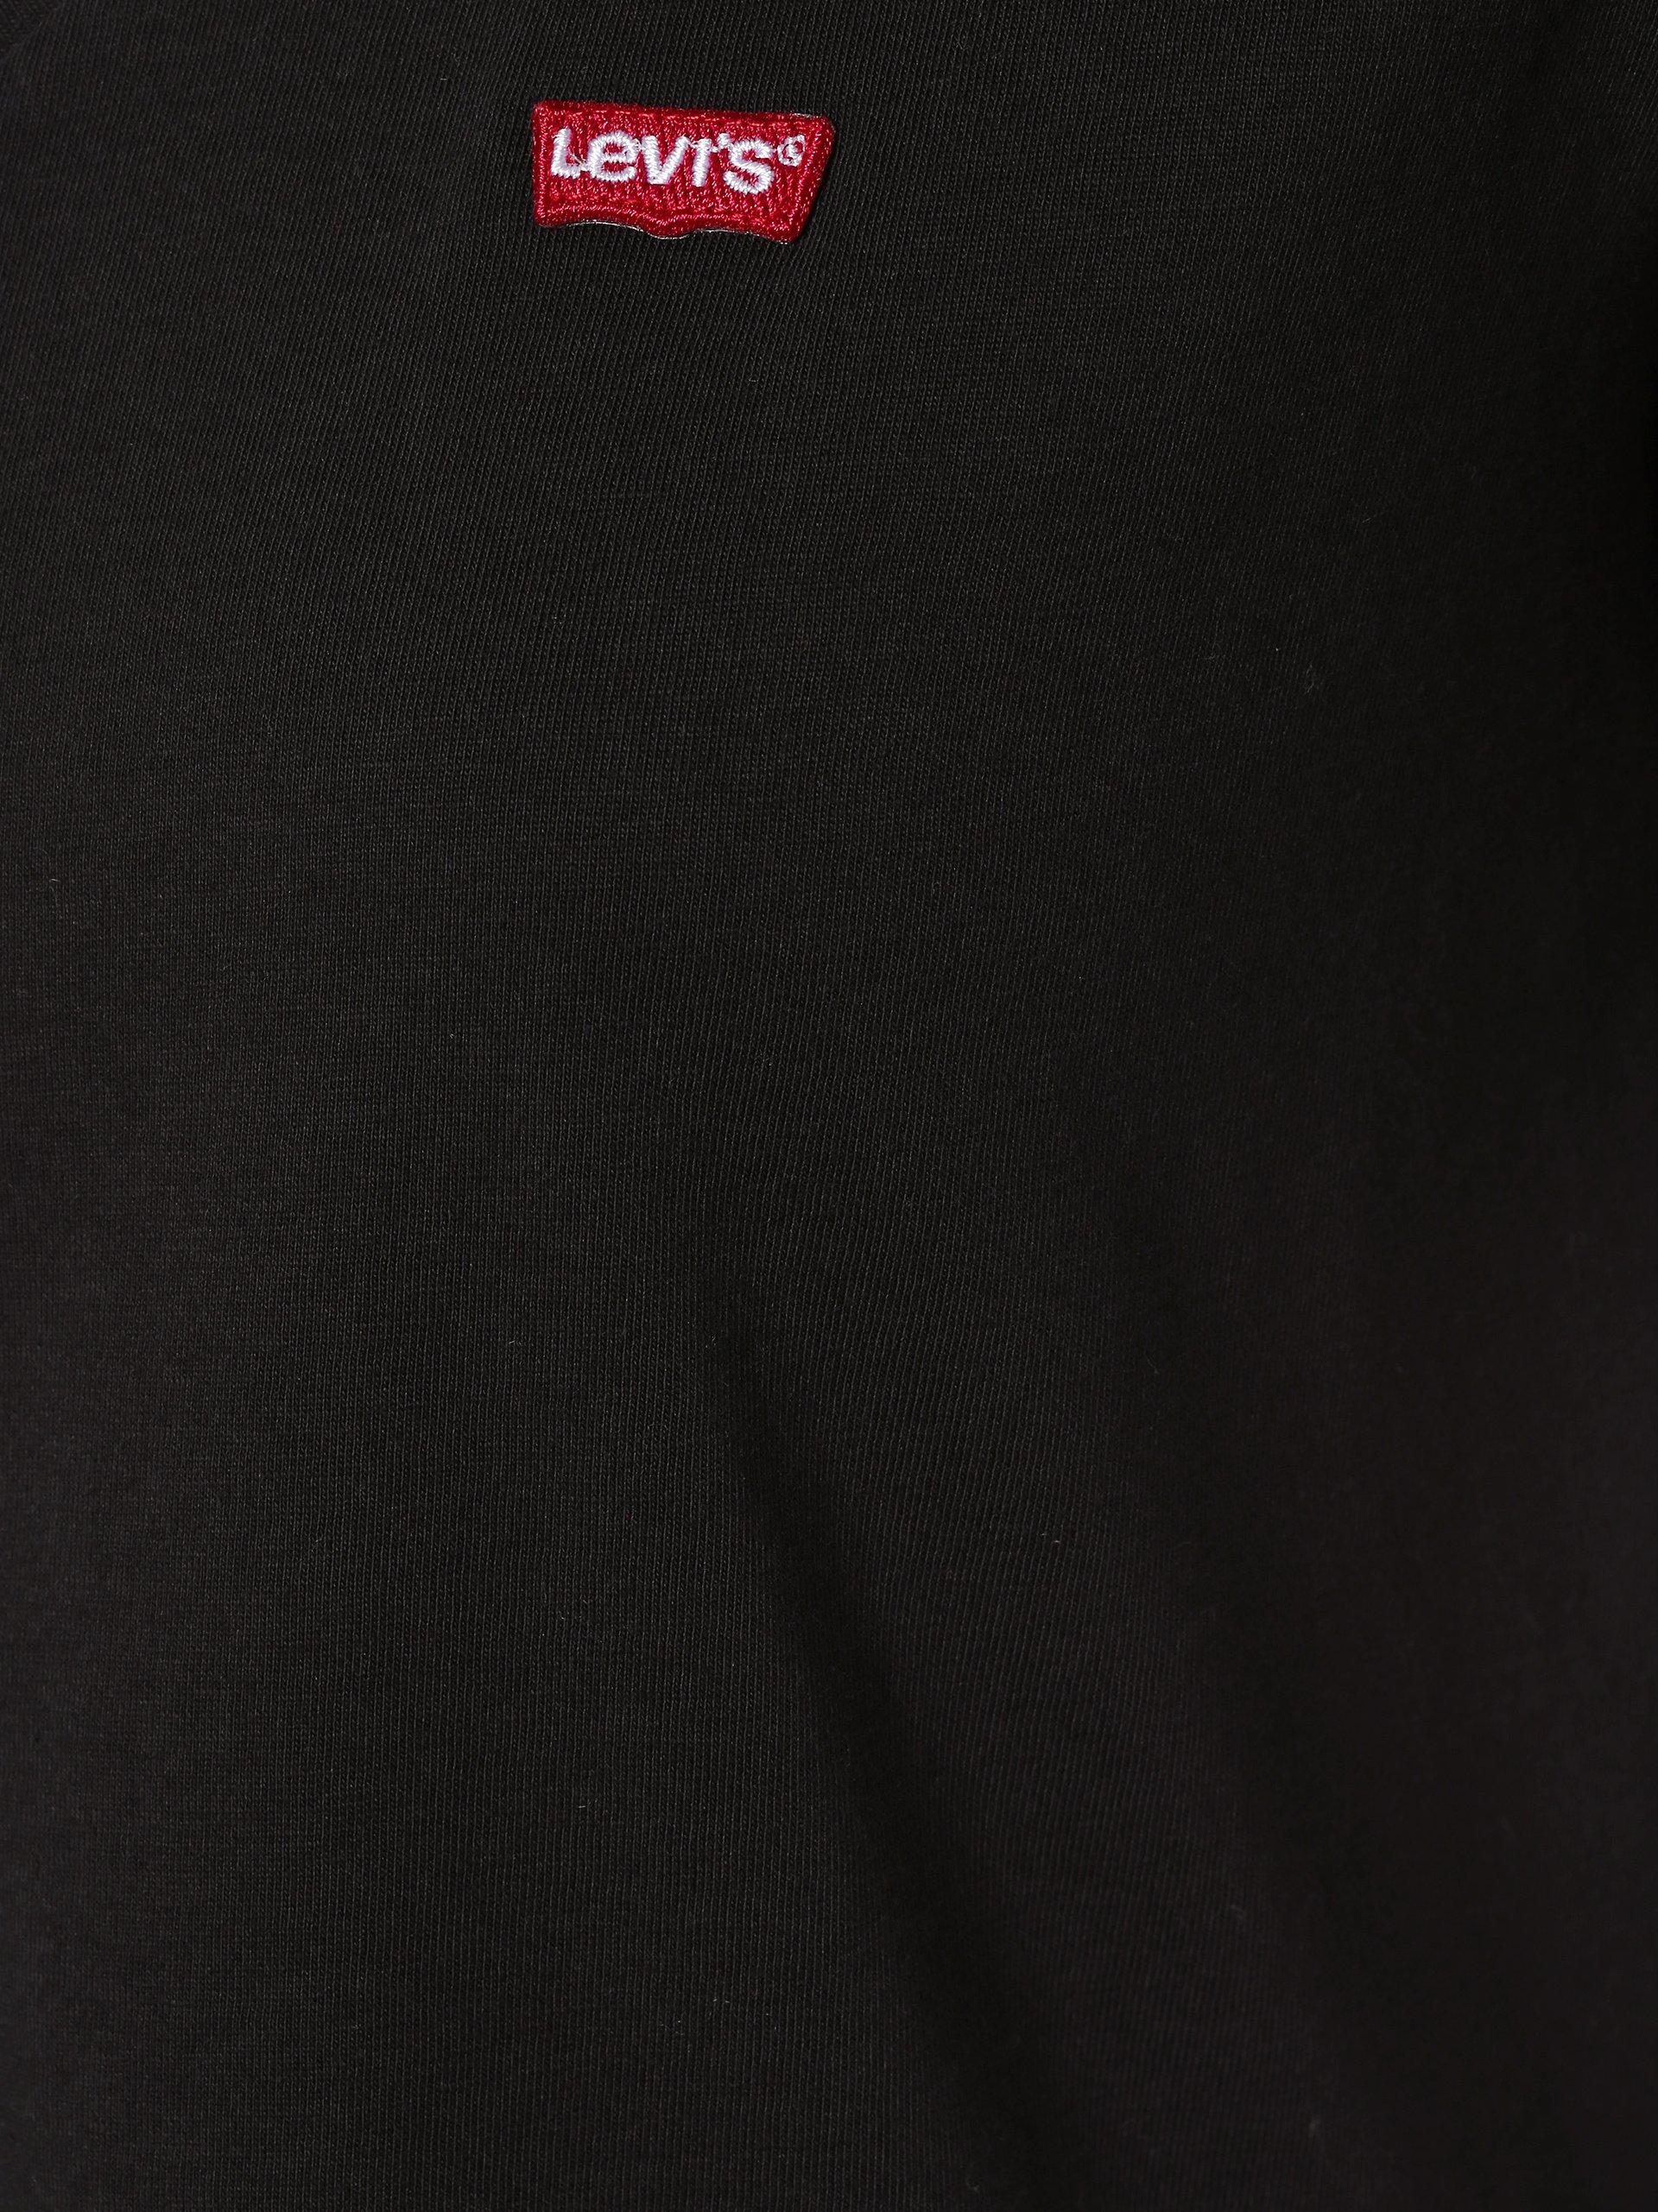 Levi\'s Damen T-Shirt